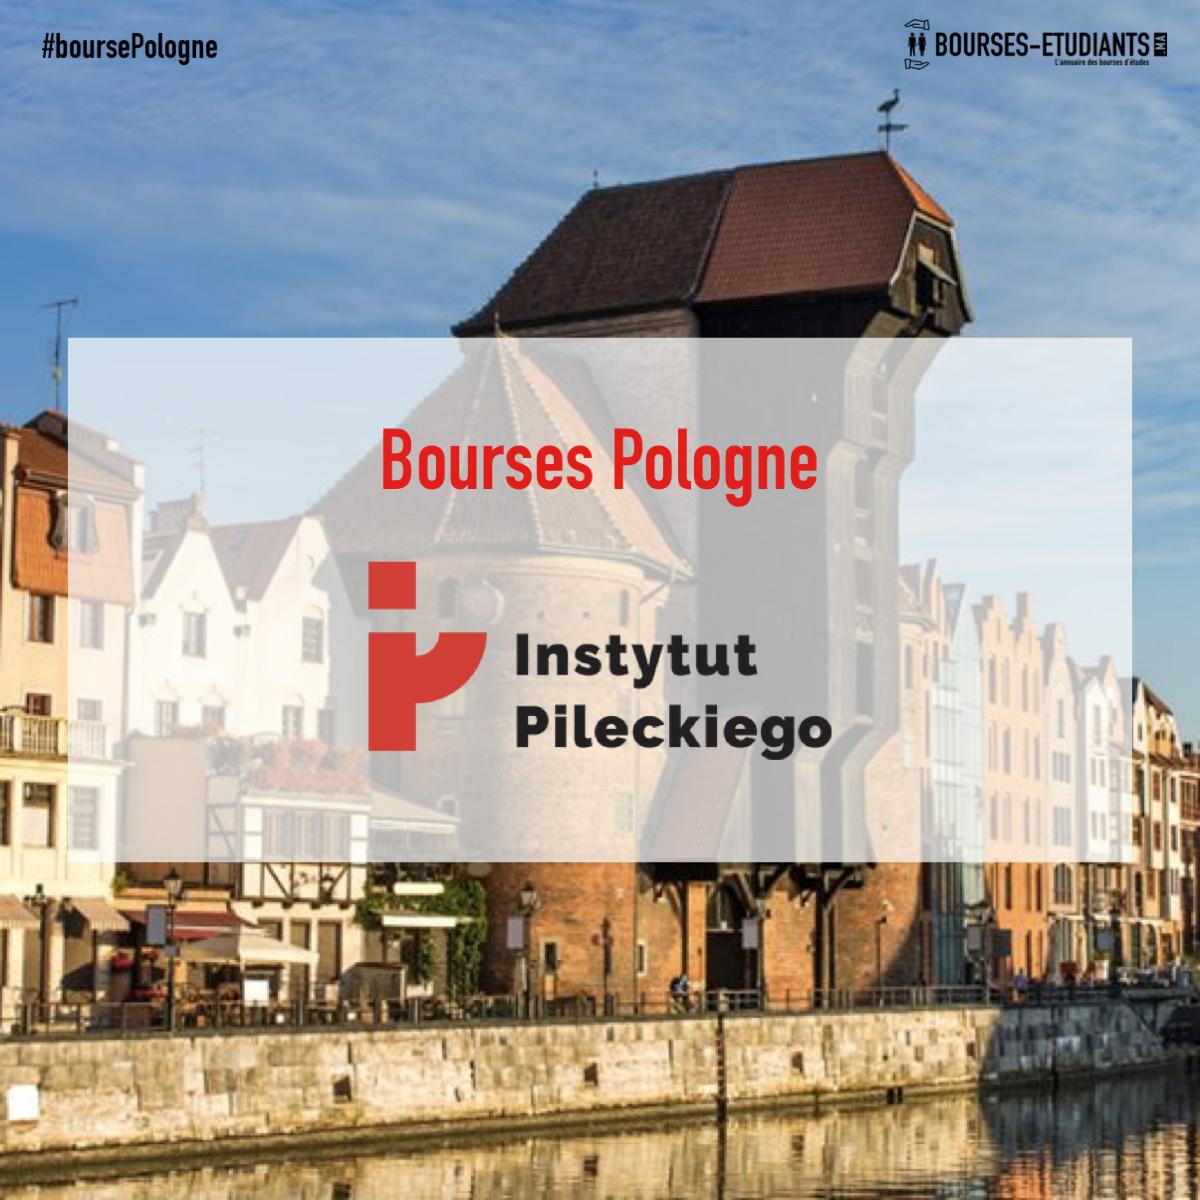 Bourse pologne